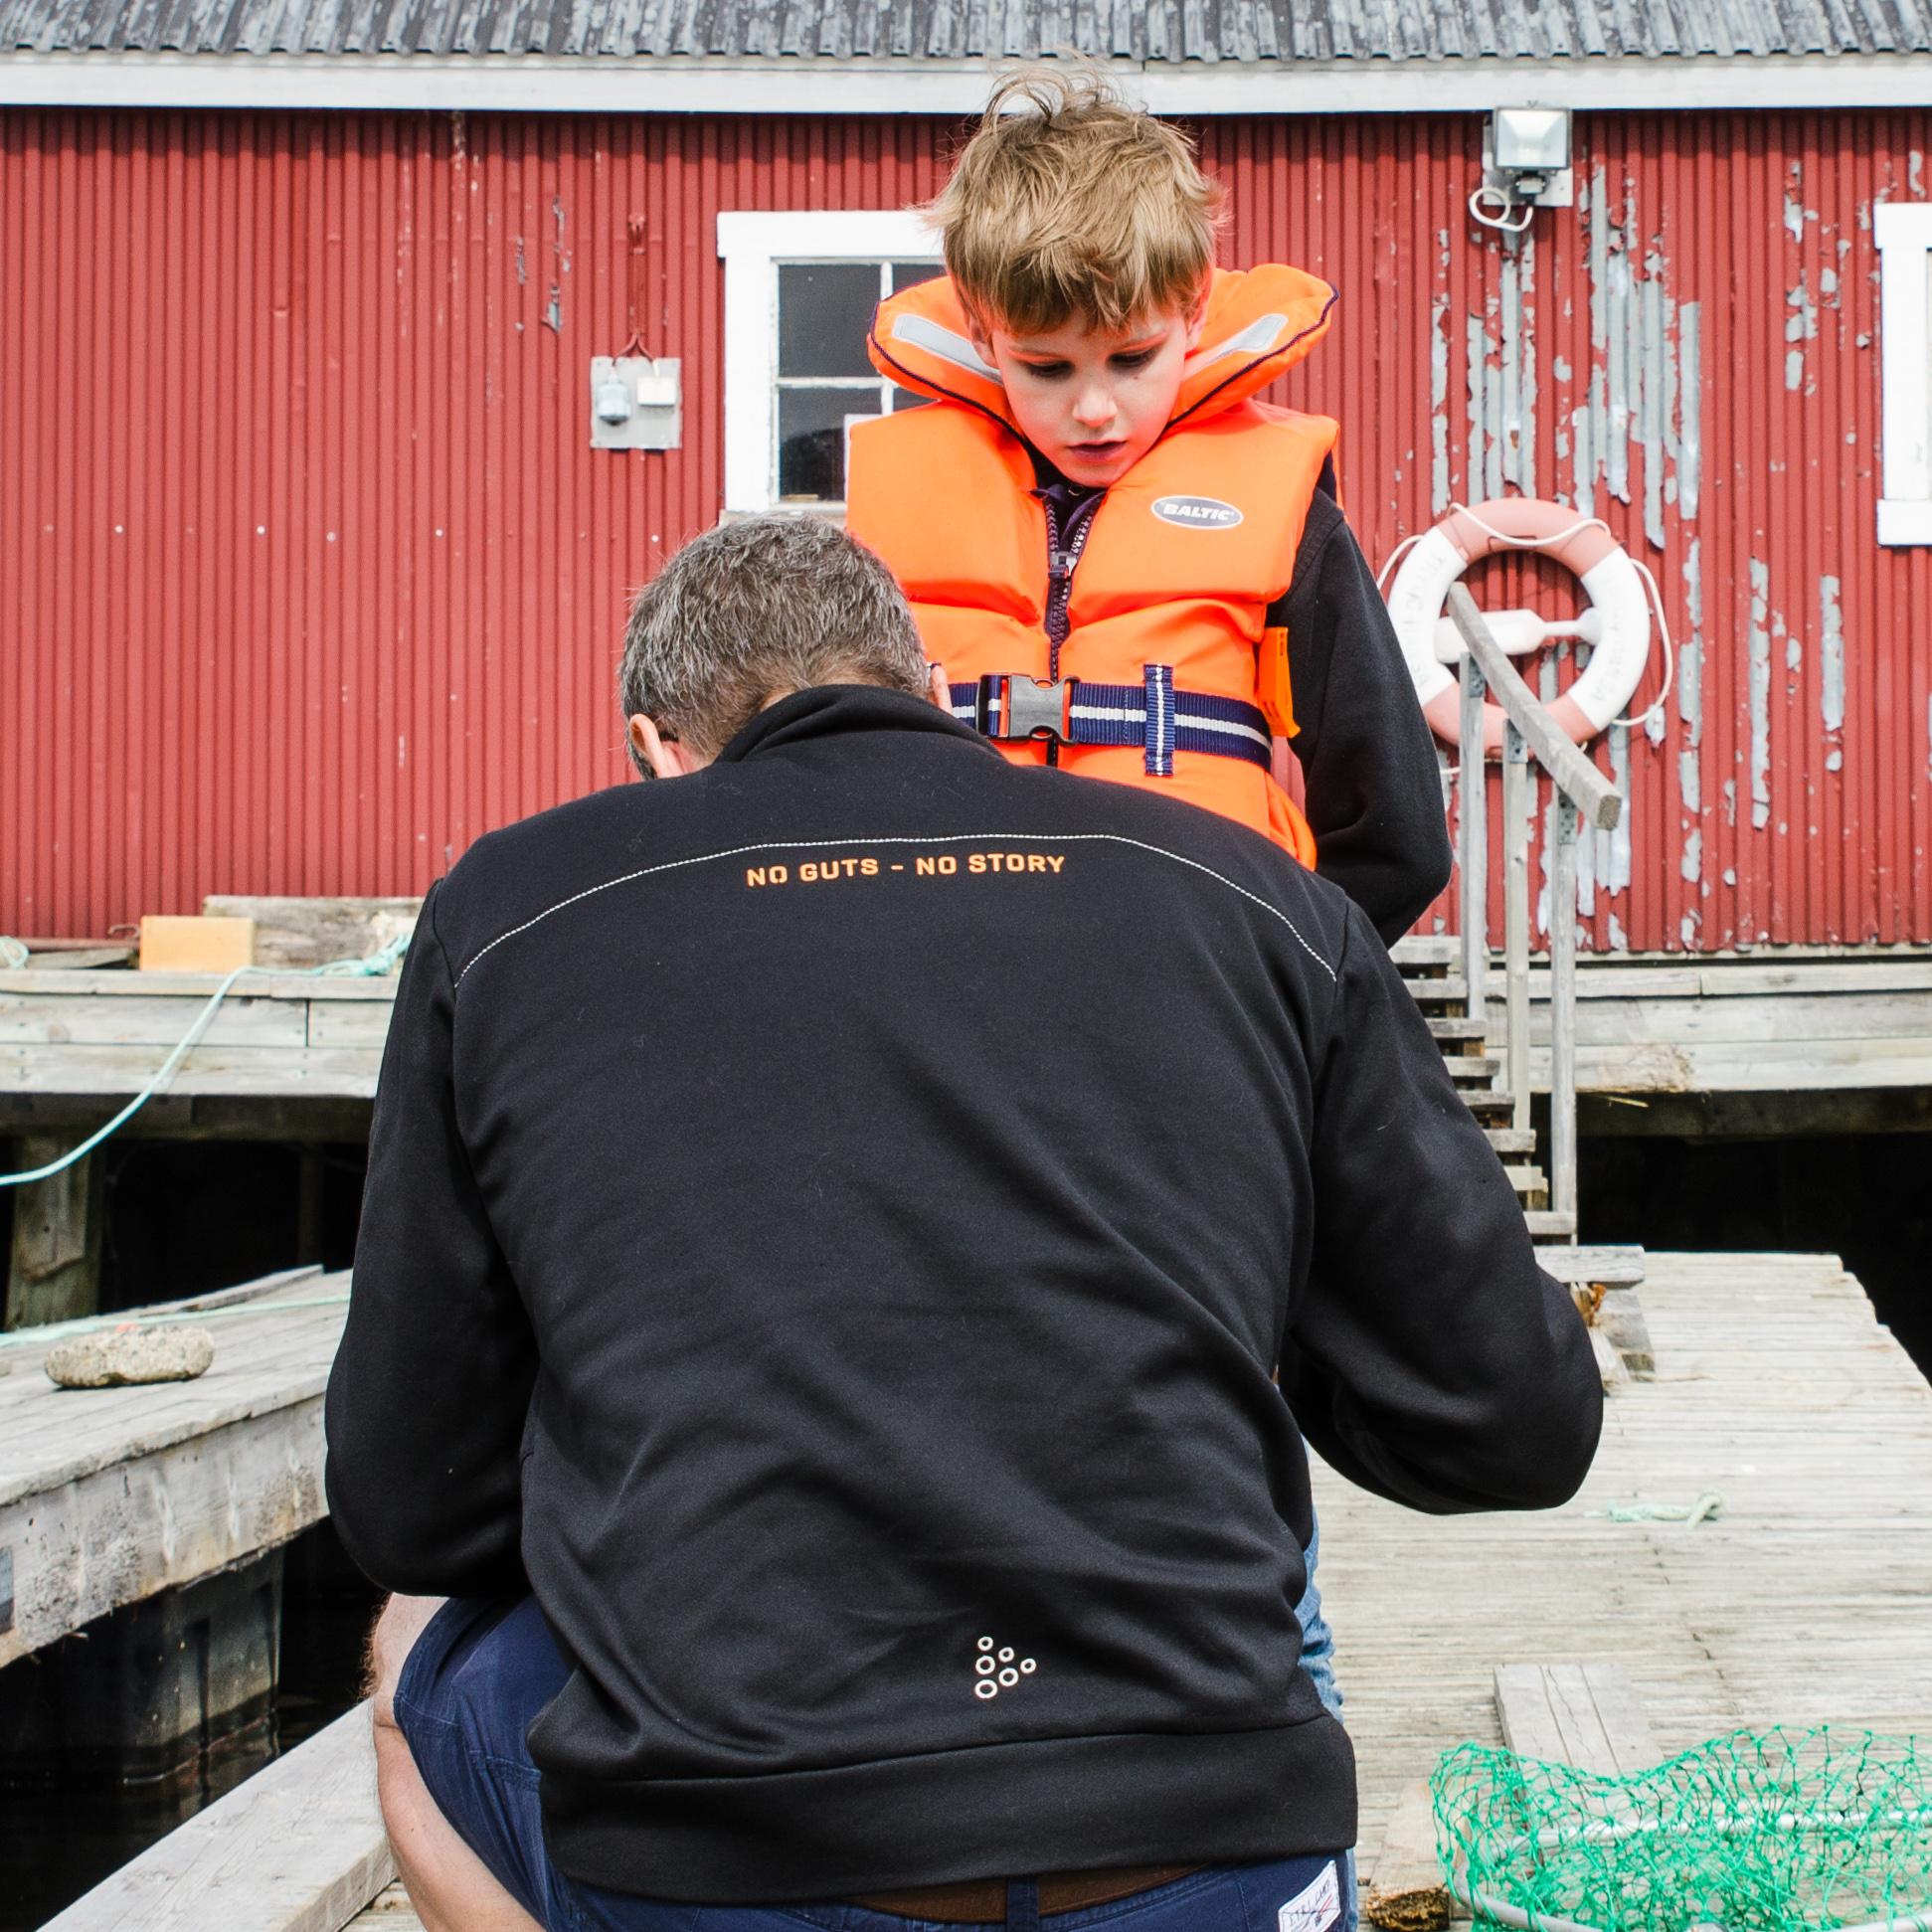 Jävre fiskecamp